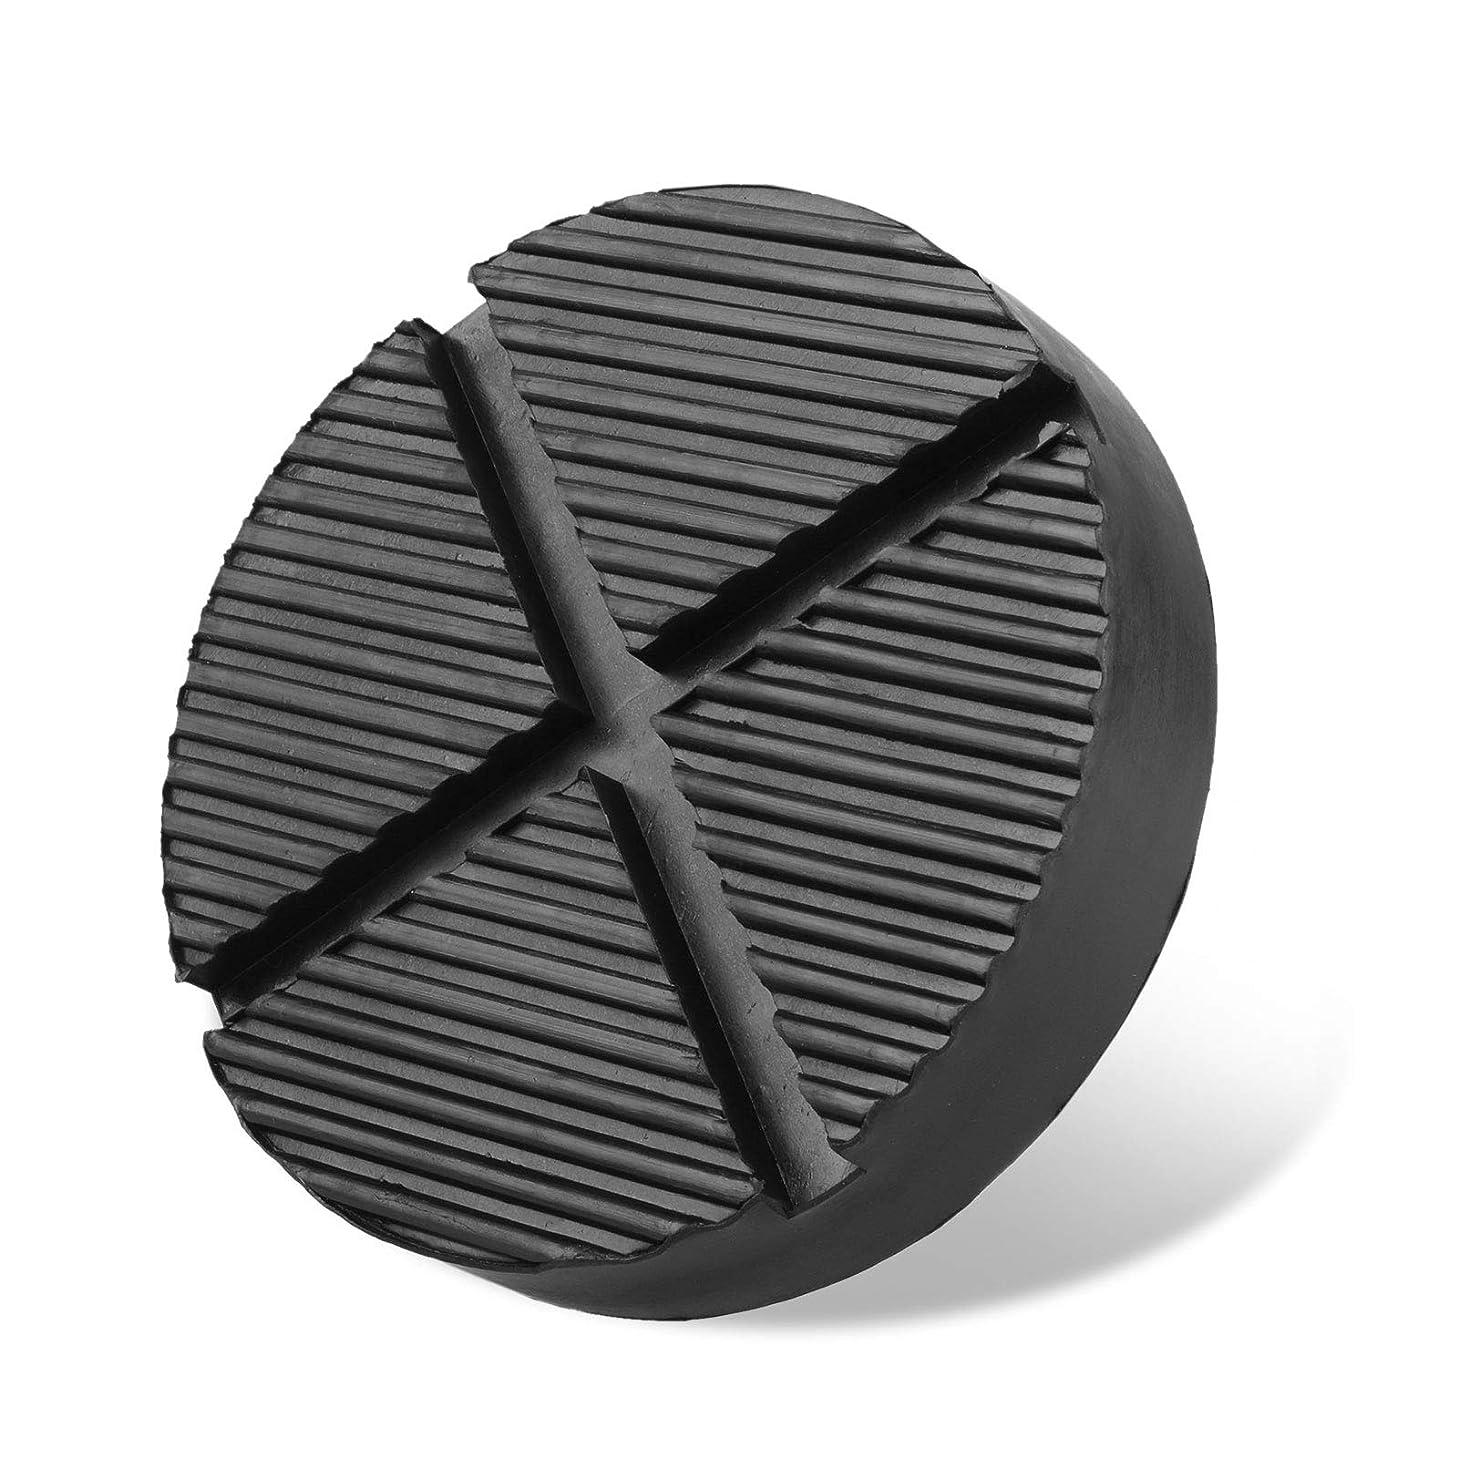 EEEKit Cross Slotted Frame Rail Floor Jack Disk Rubber Pad for Car for Pinch Weld Side Universal Jack, Black